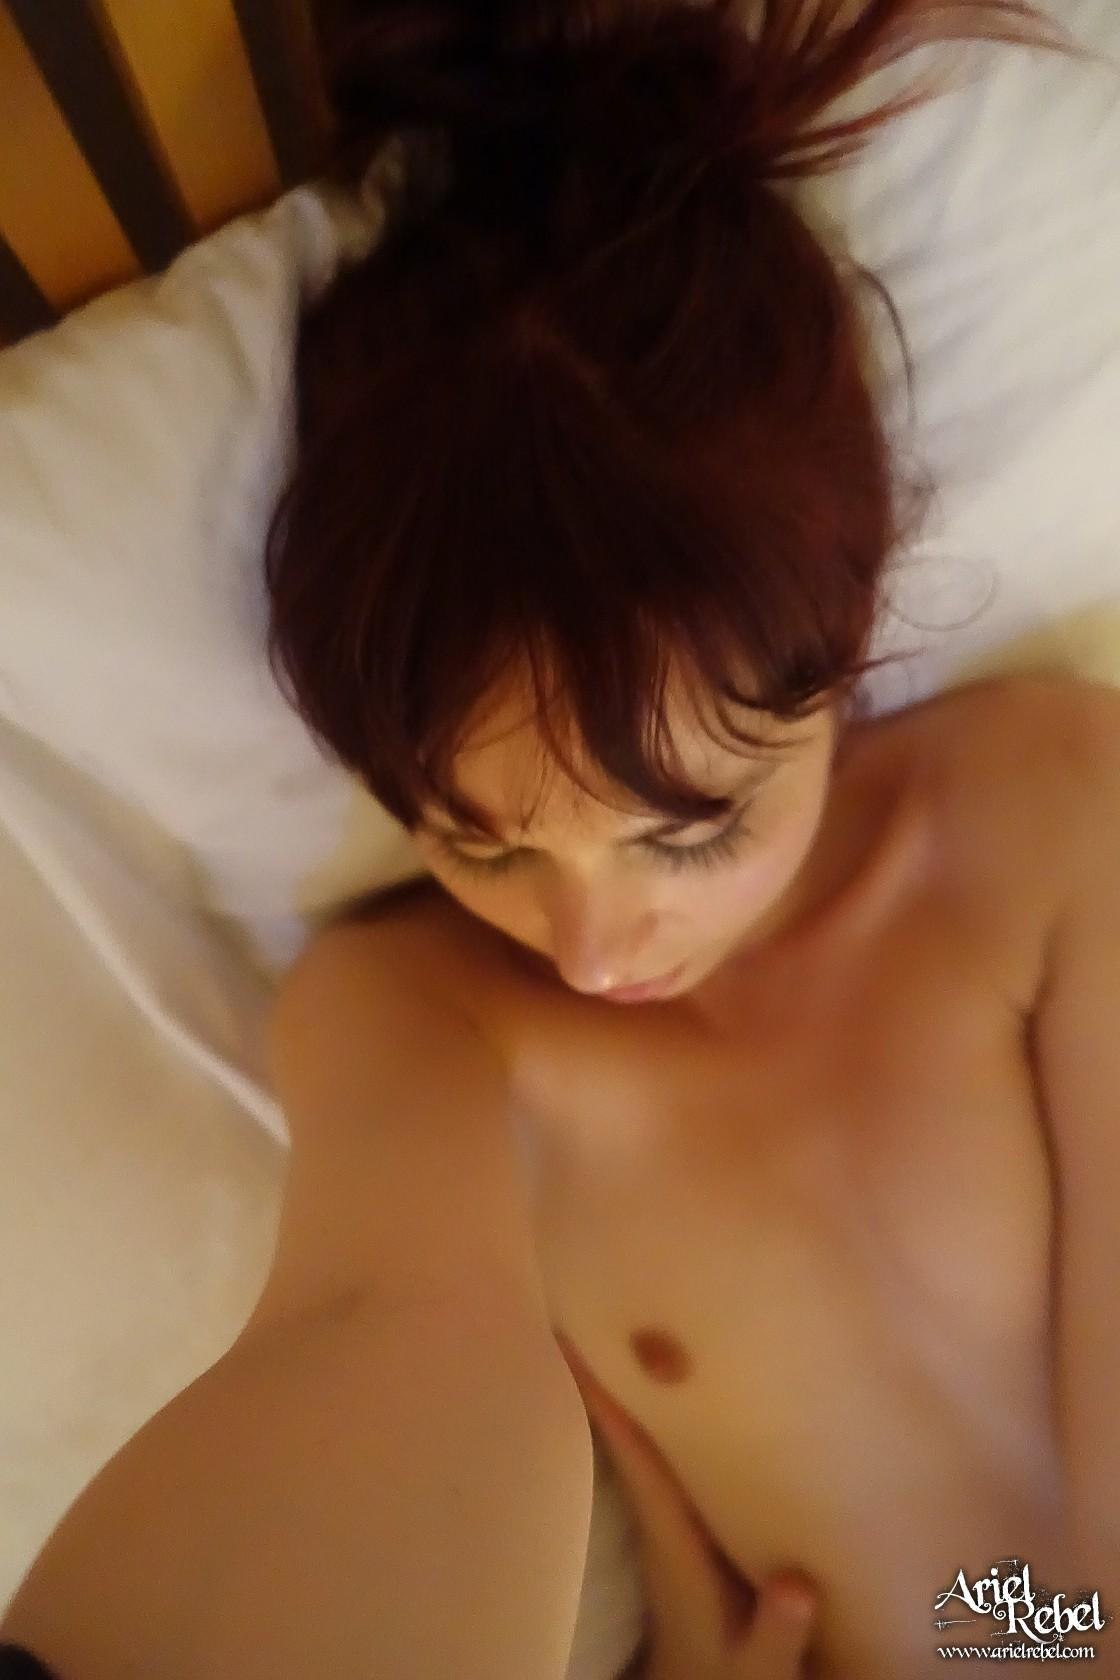 tantra massage Jylland dansk pirno